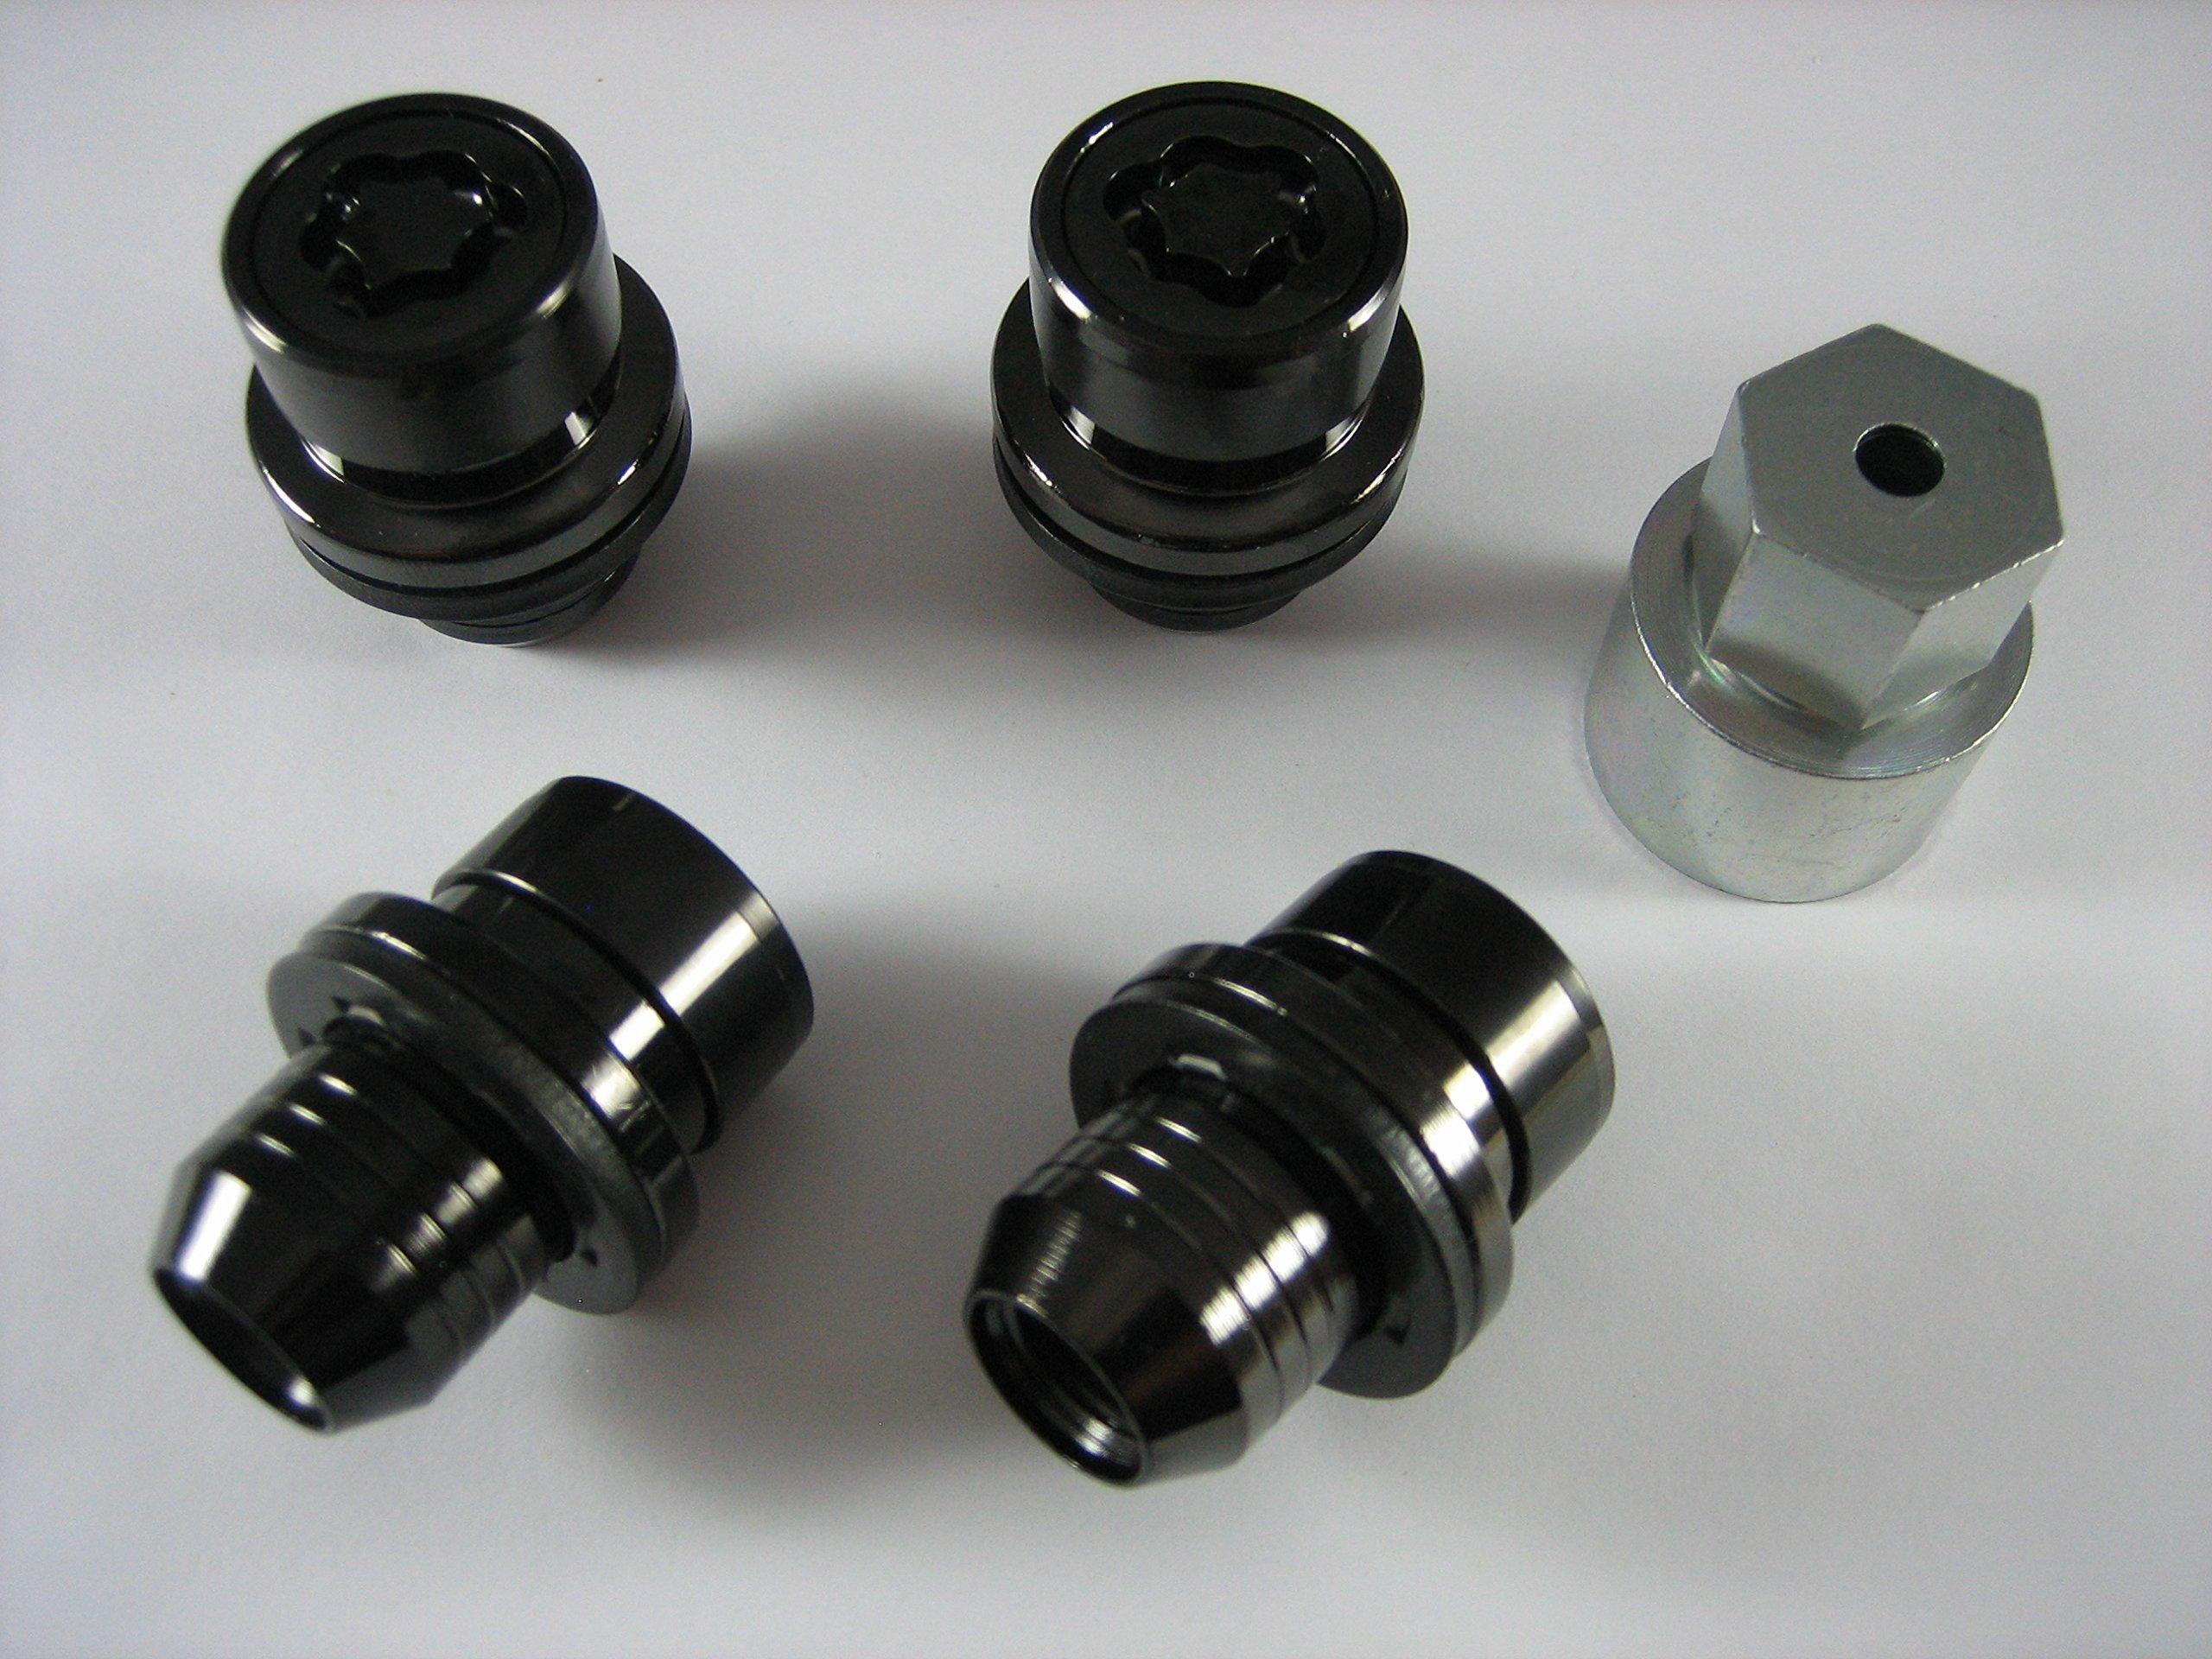 Genuine Land Rover Gloss Black Wheel Lock Set for LR3 LR4 Range Rover and Sport